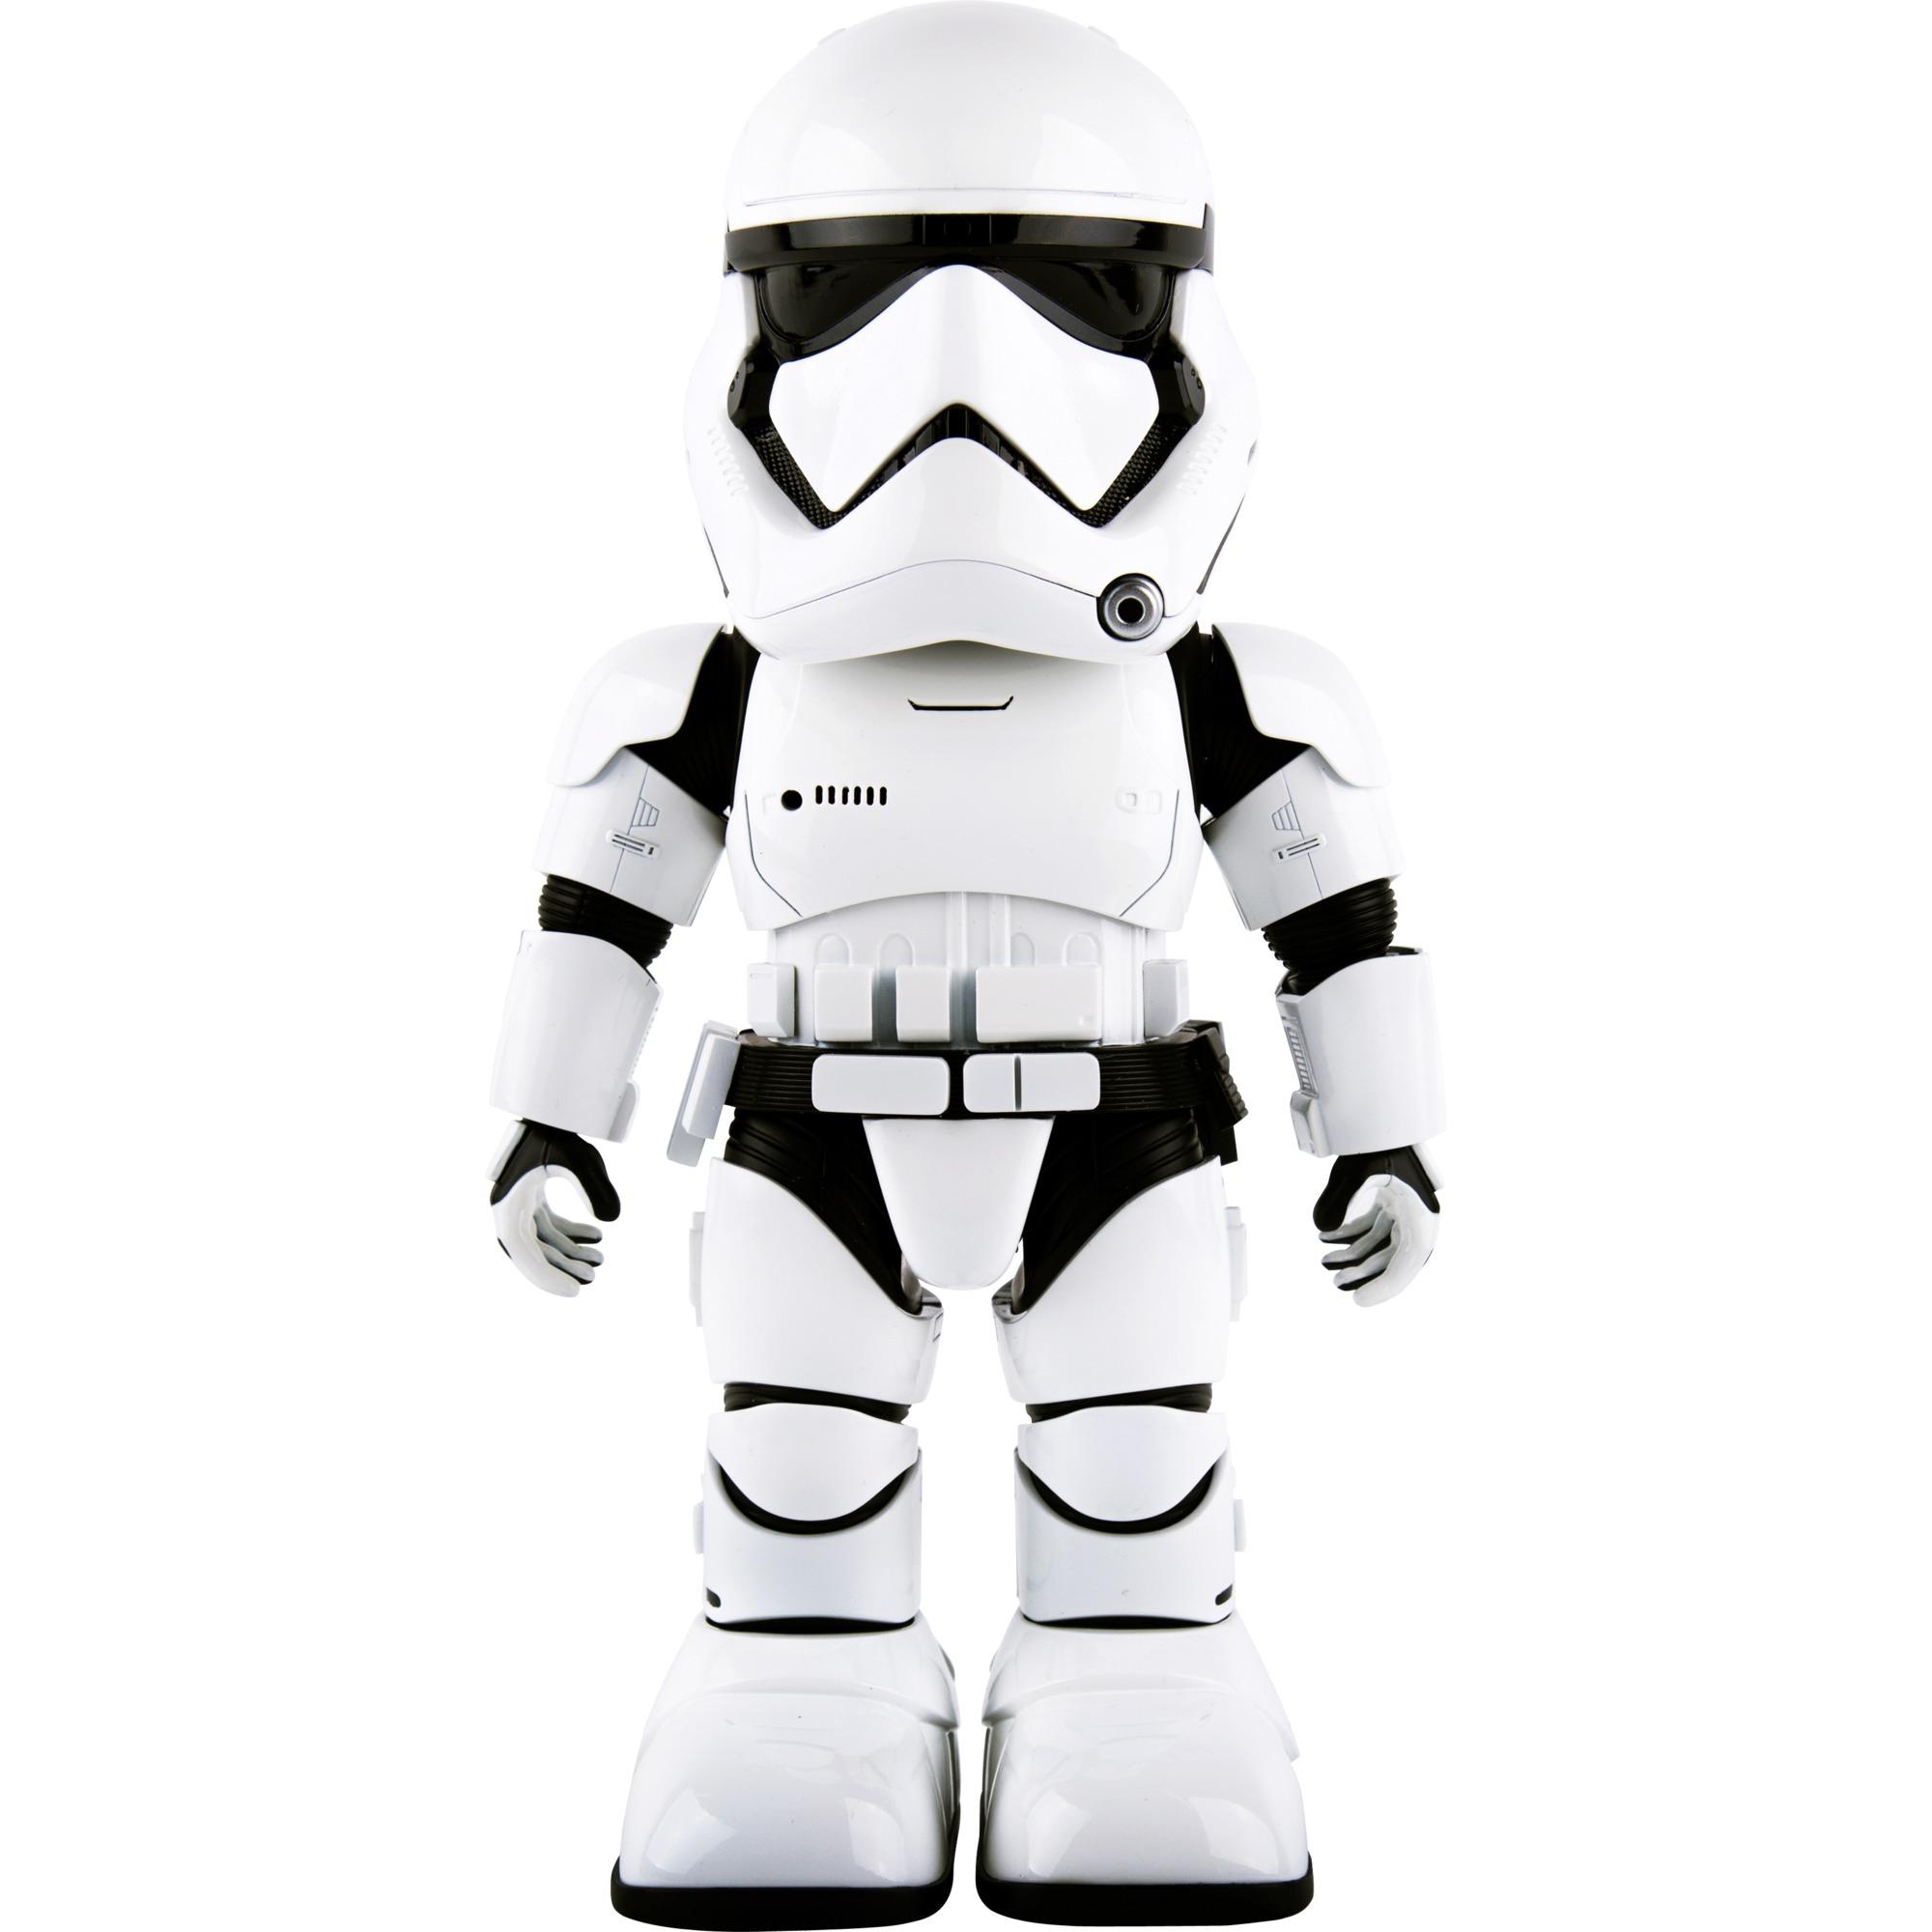 Stormtrooper Robot programable, Radiocontrol